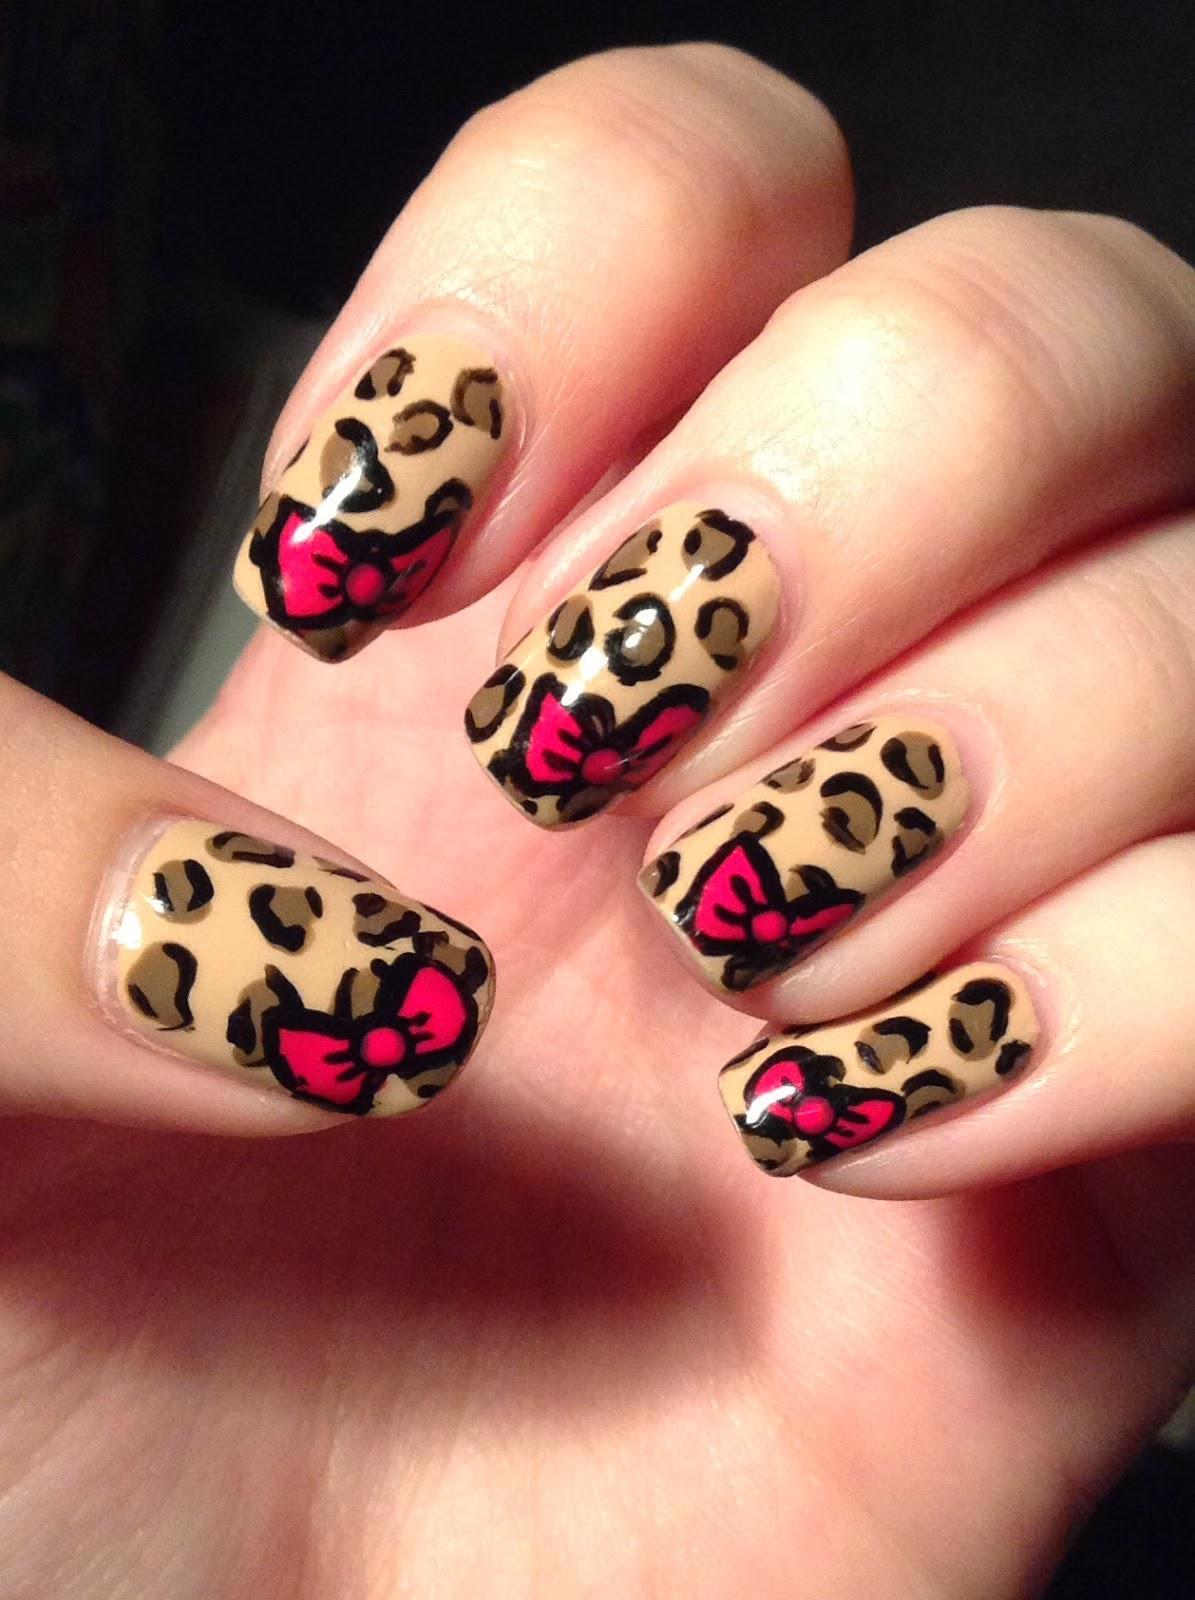 Тигровые ногти фото с рисунком